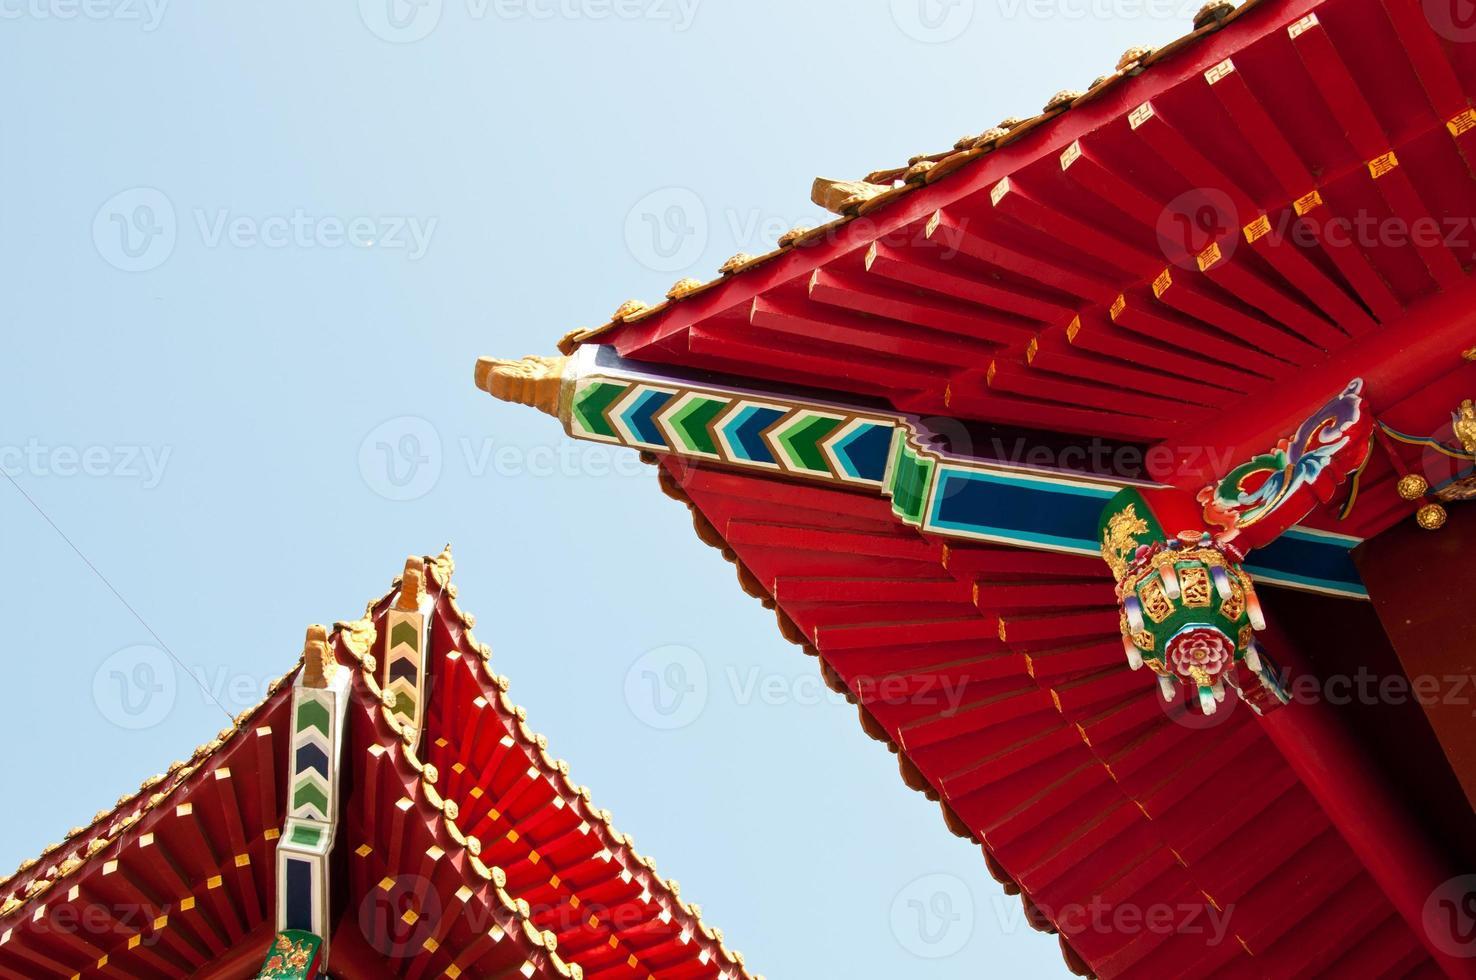 wenwu tempel dak in sun moon lake taiwan foto